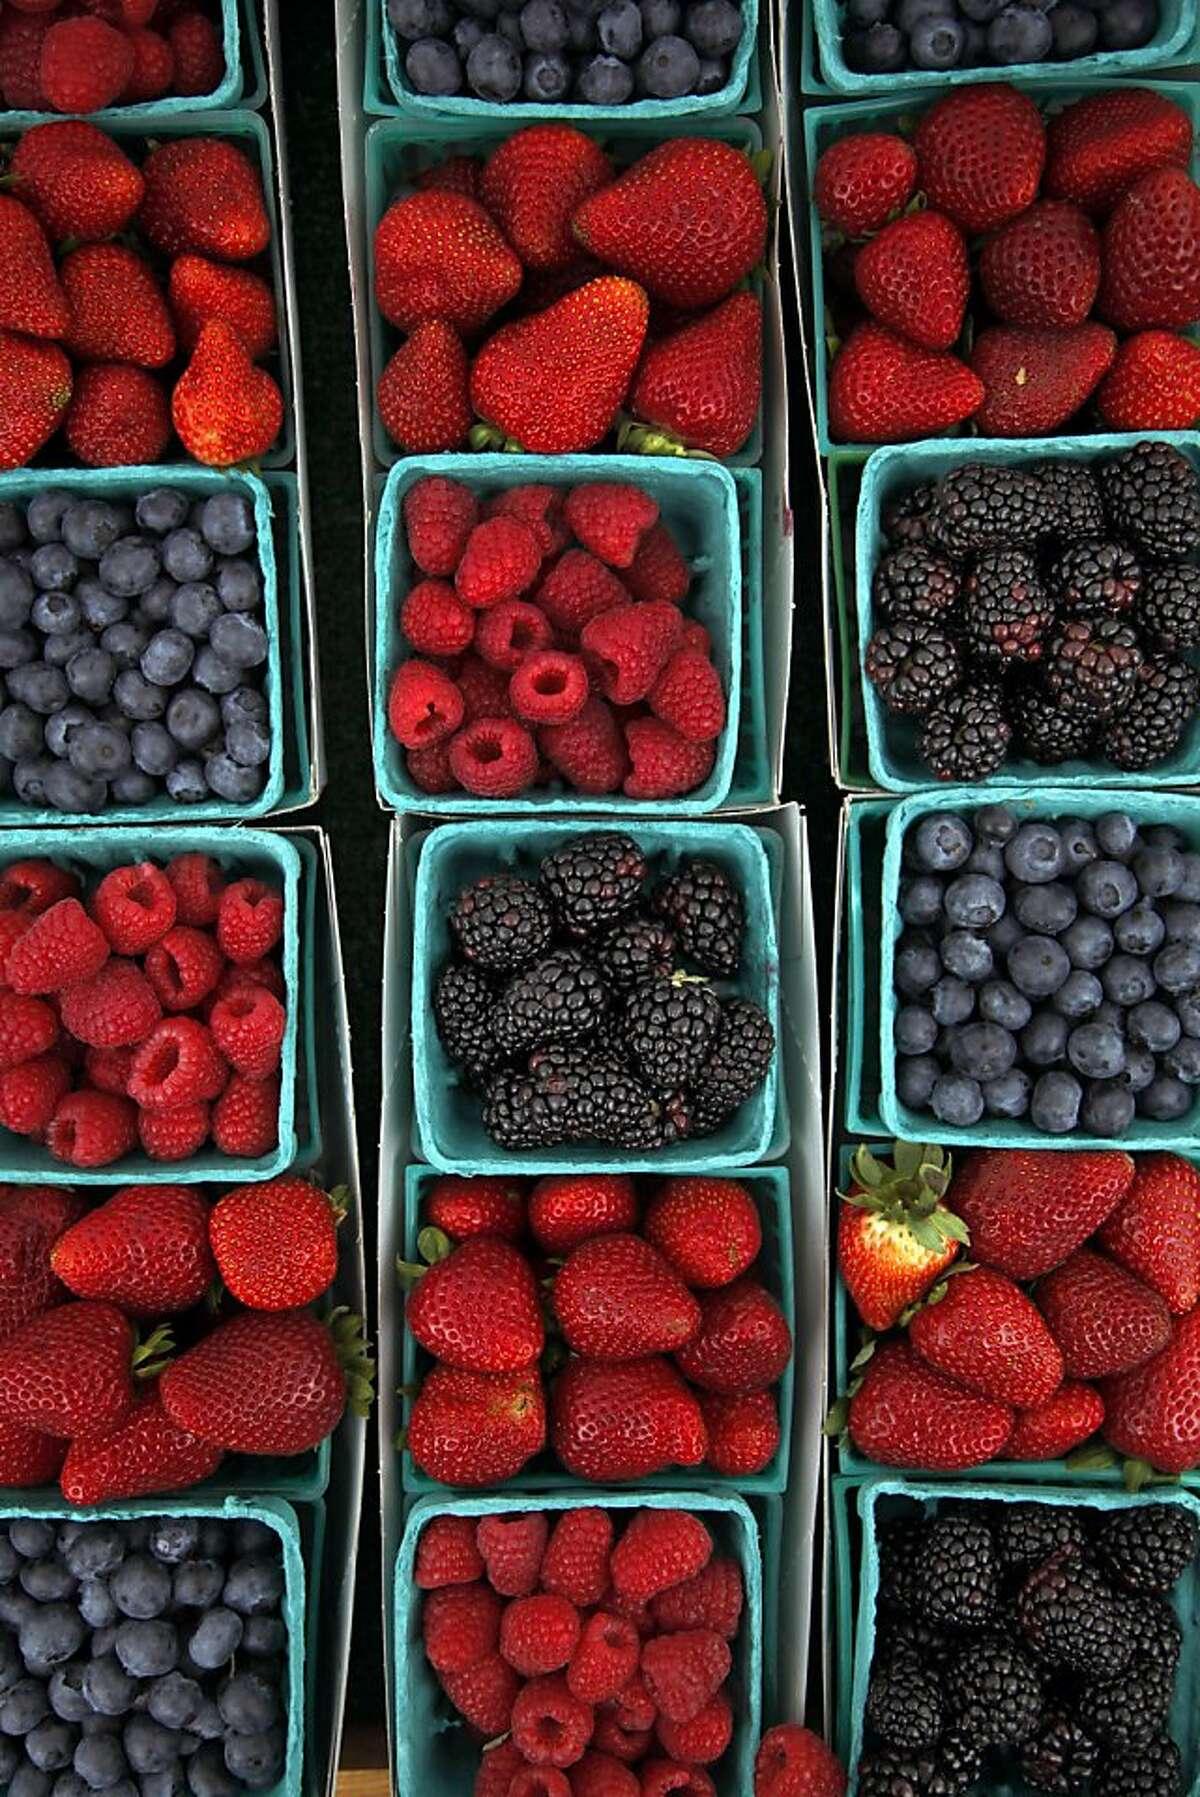 Berries at Aptos Farmers' Market in Aptos, Calif., on Saturday, August 3, 2013.